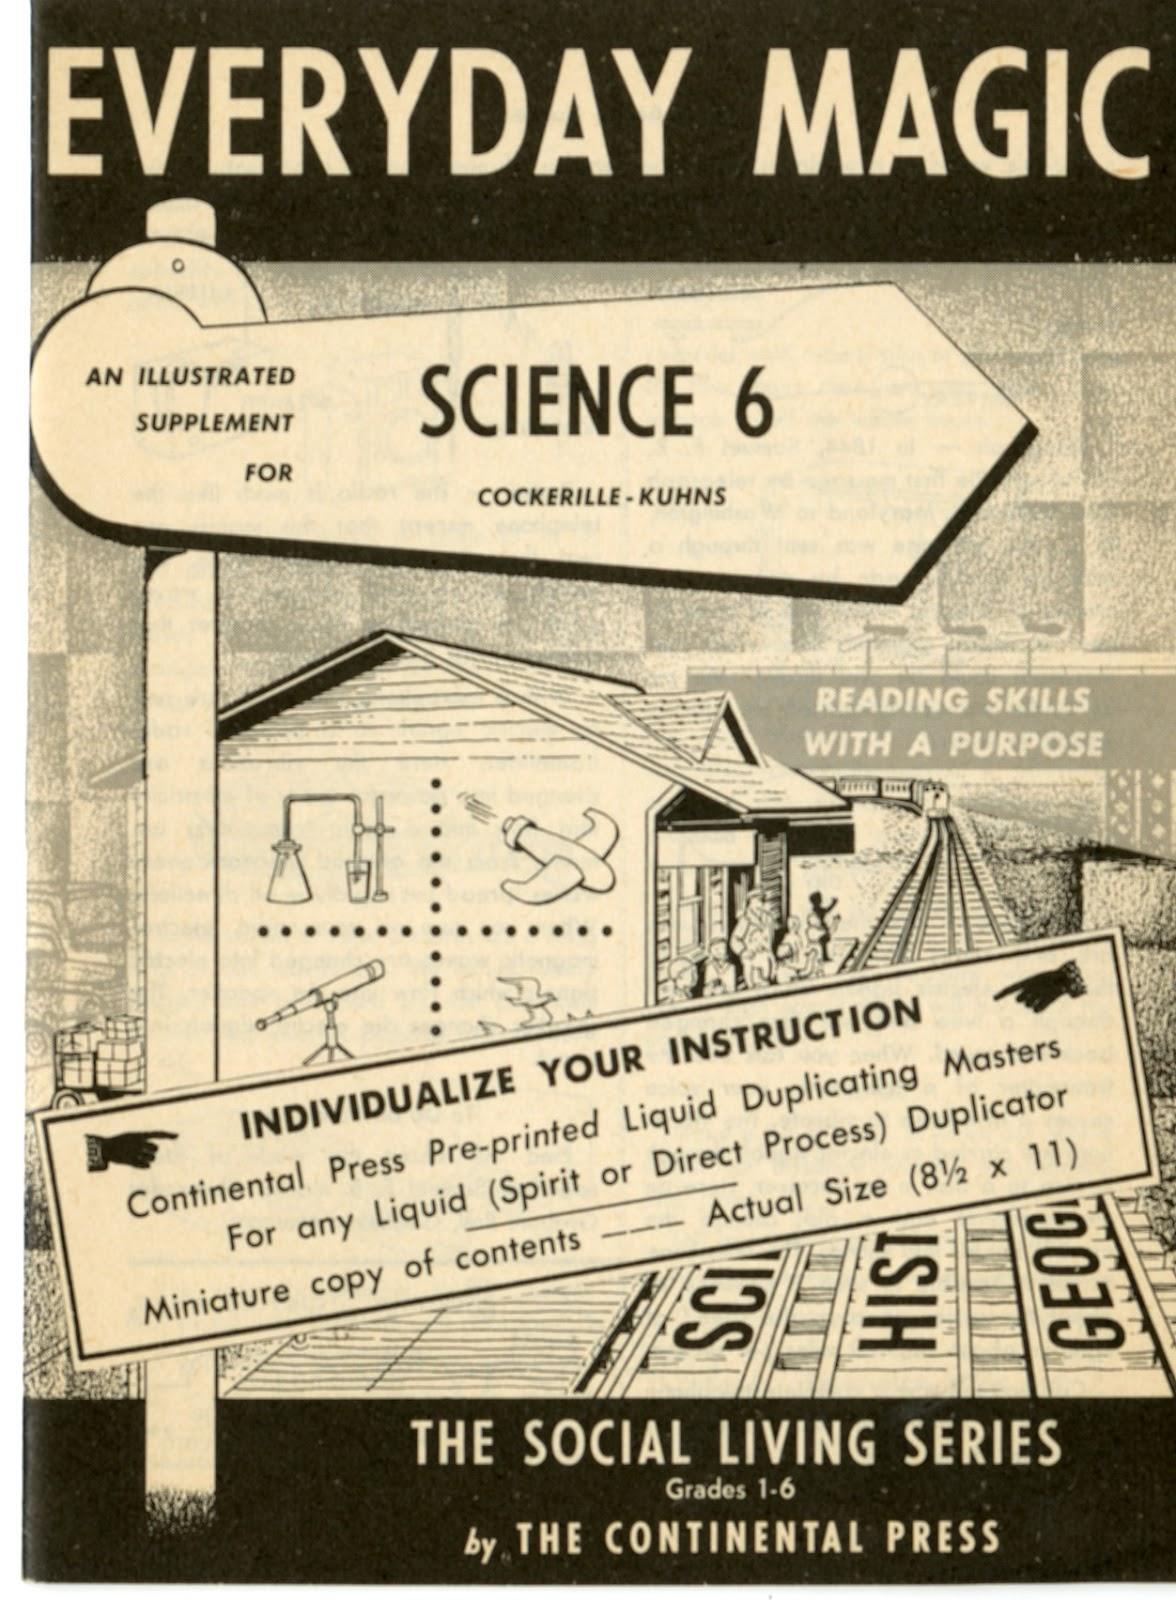 space science printables grade 5 teacher - photo #11